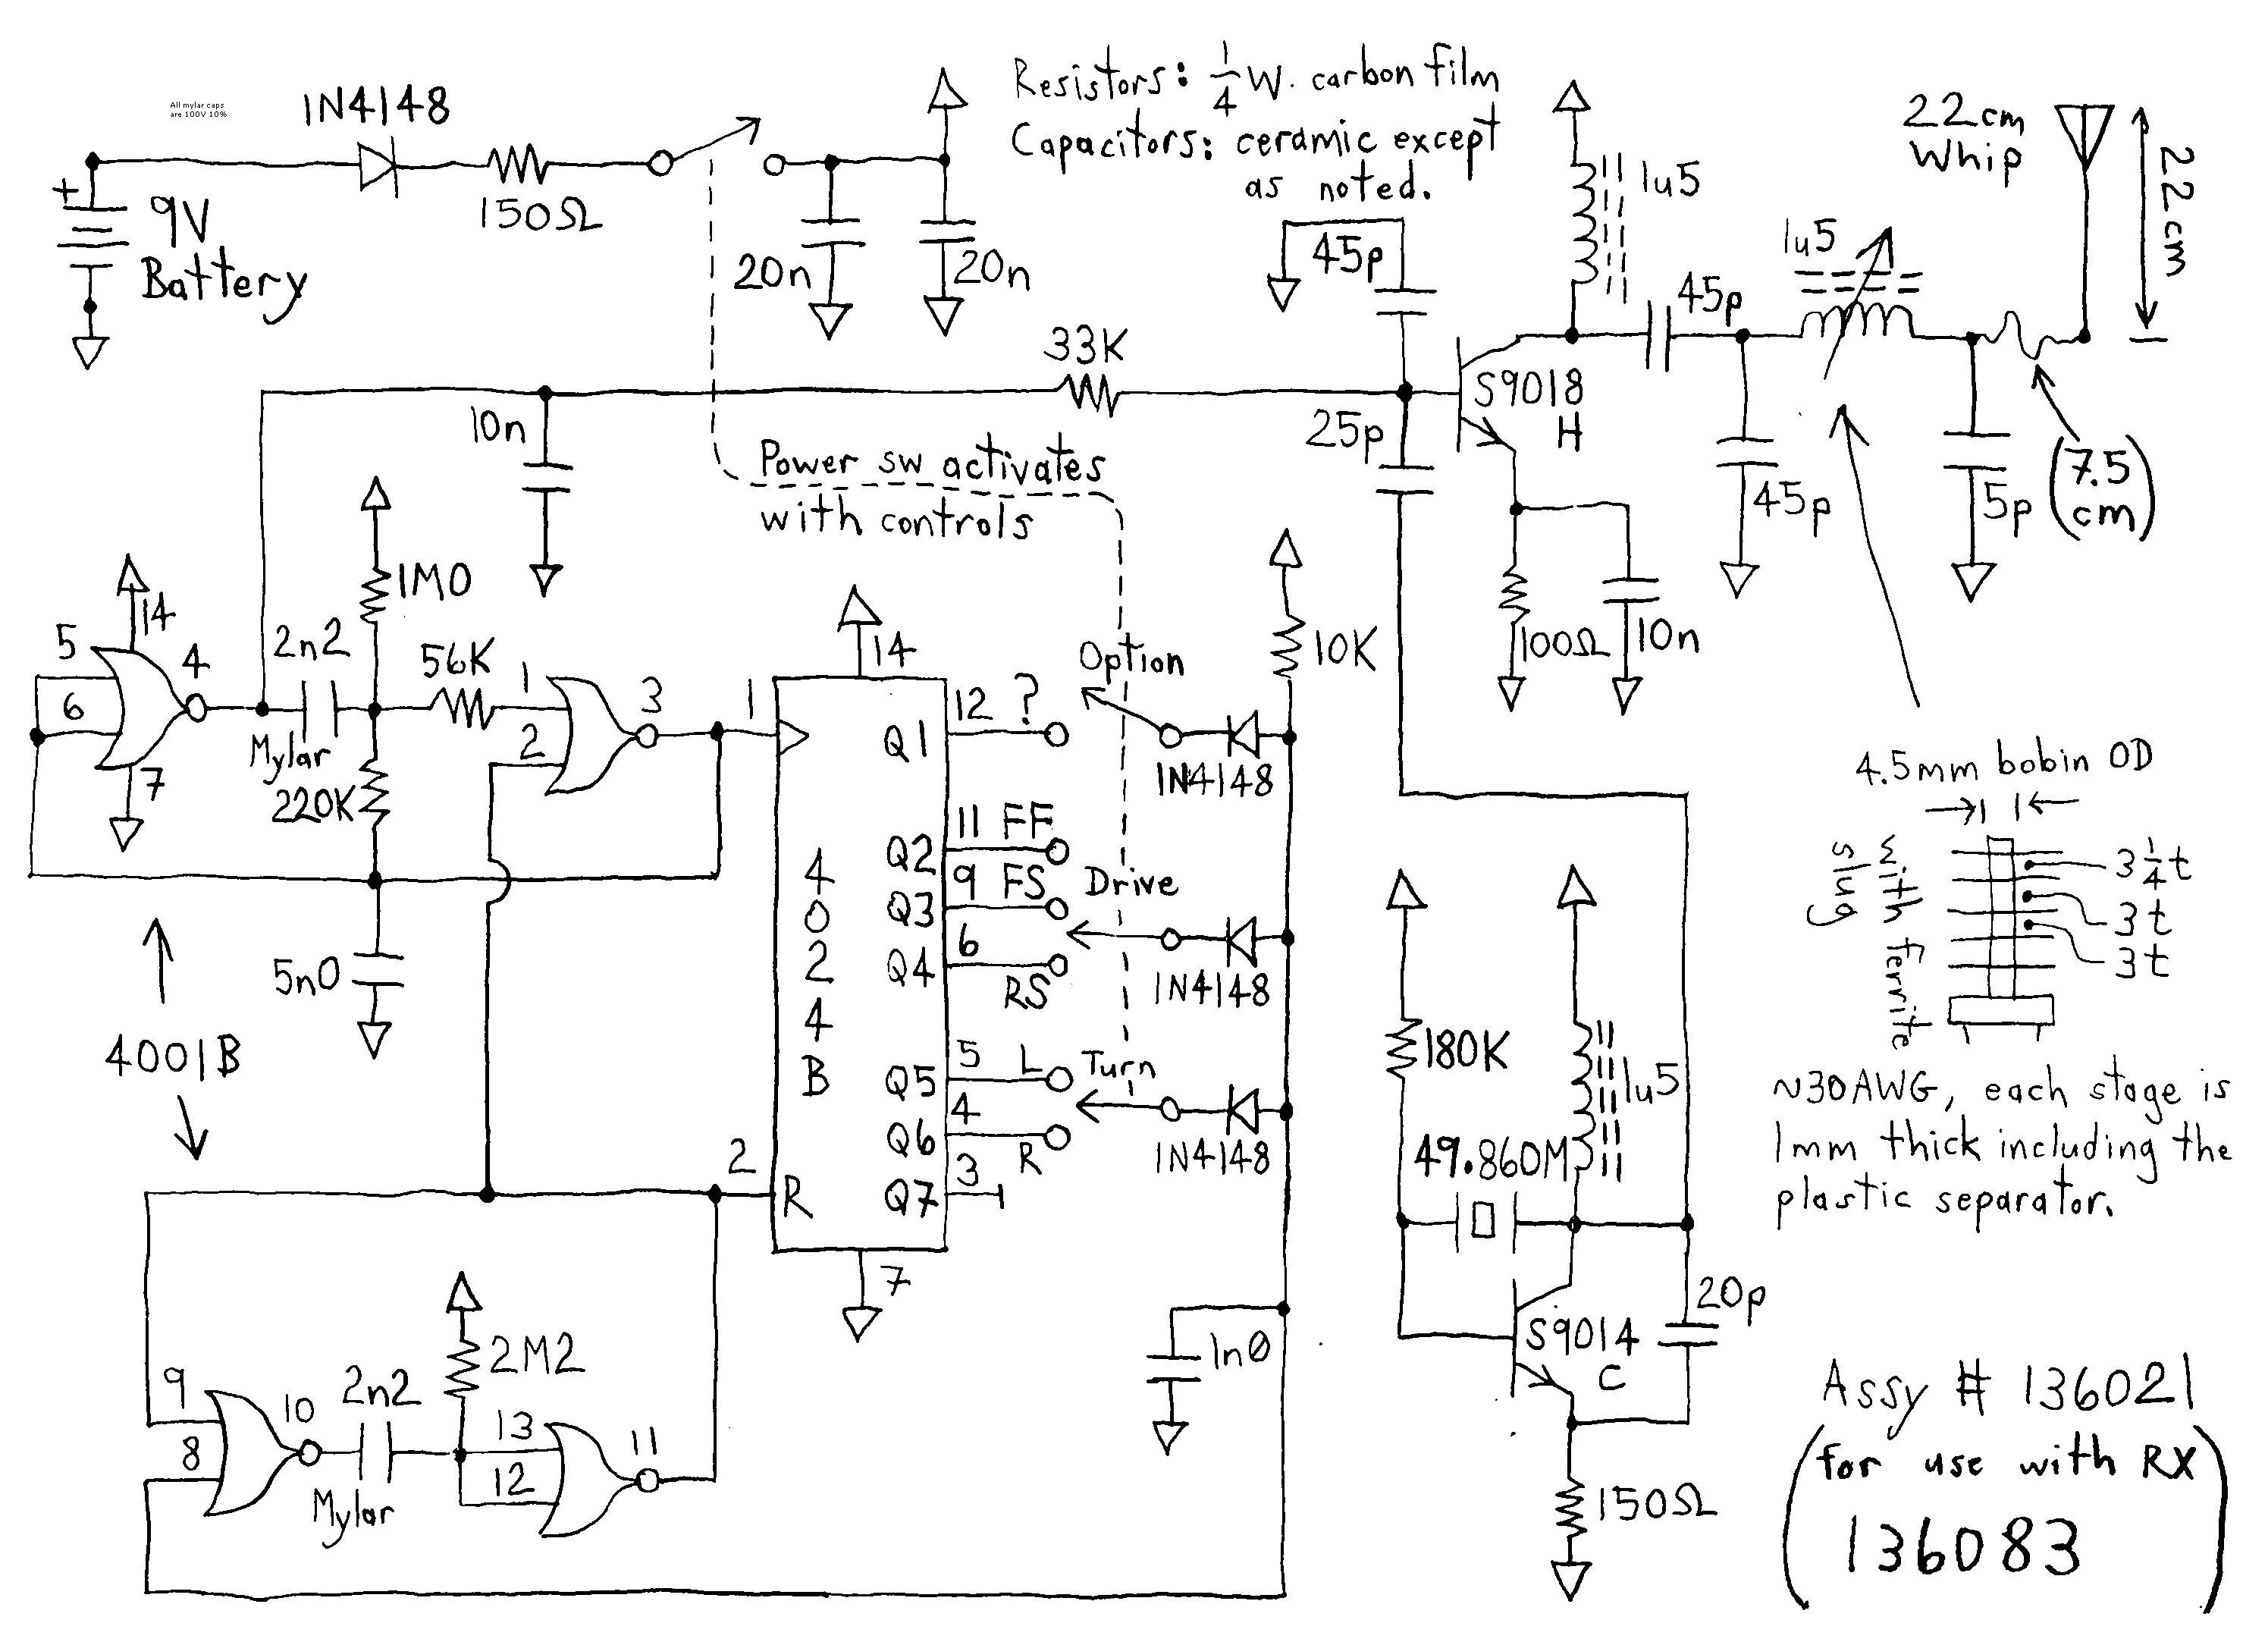 2991x2169 aircraft wiring diagram legend fresh auto wiring symbols wiring